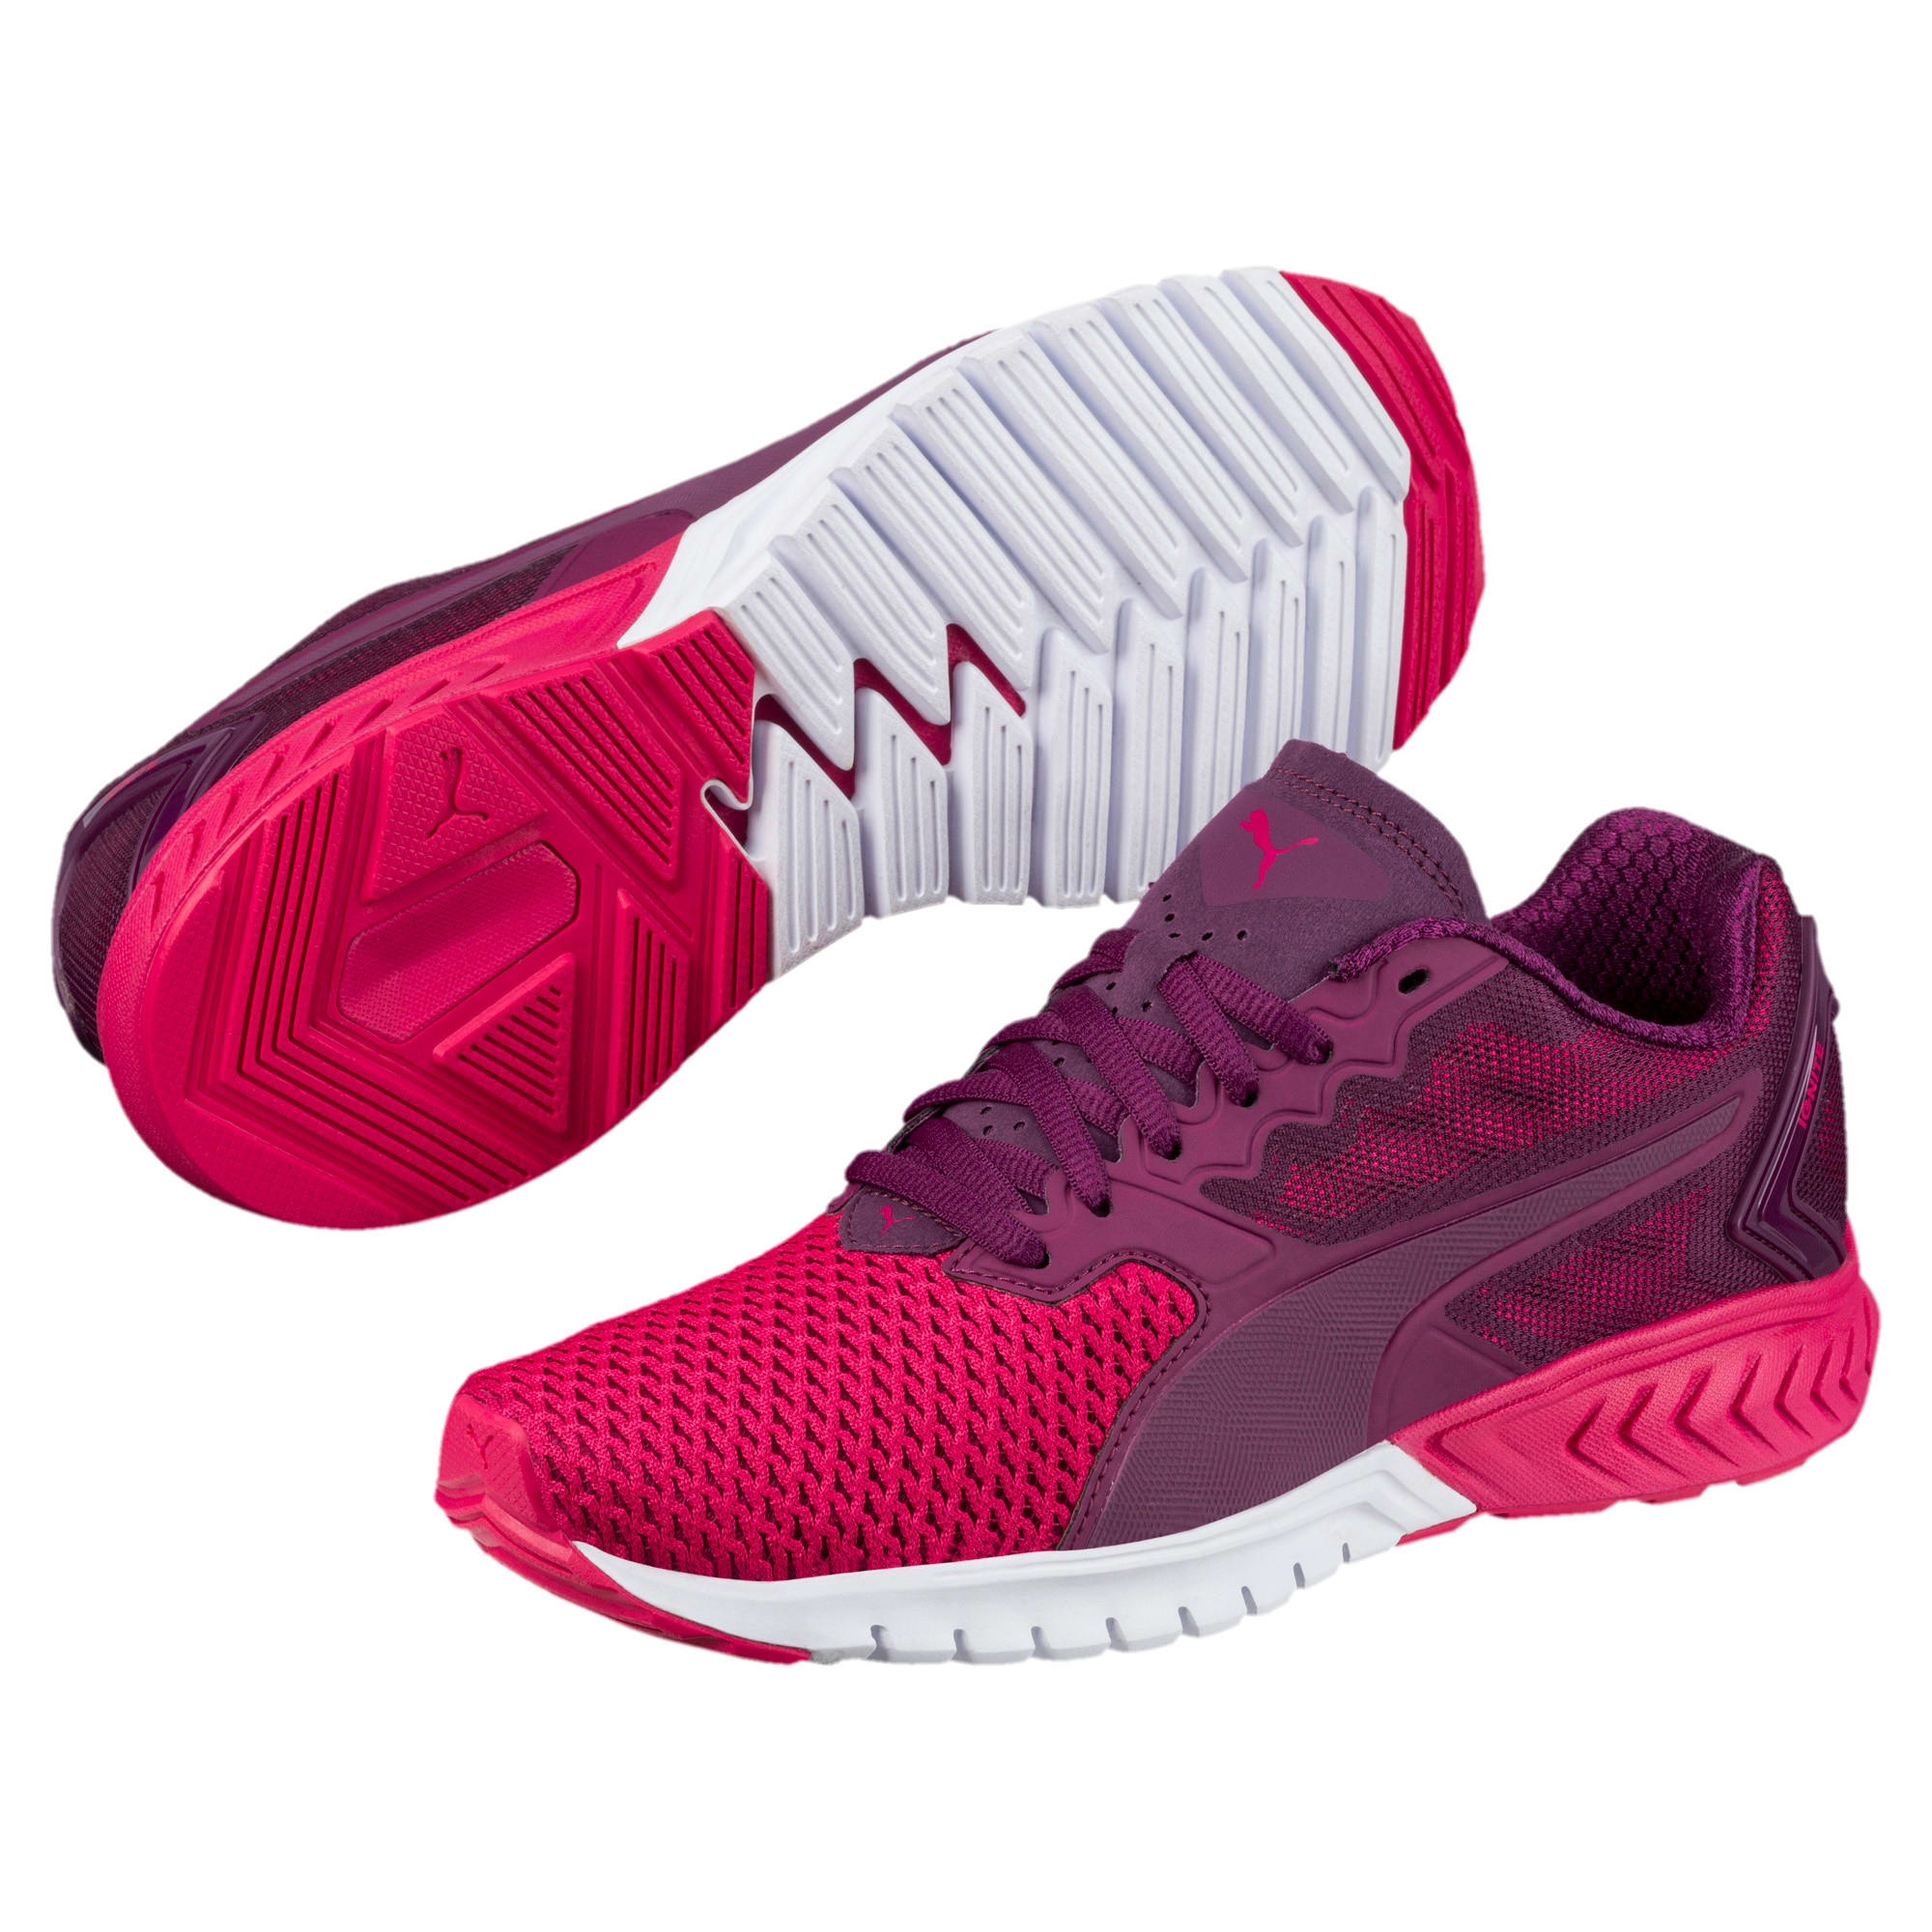 Thumbnail 2 of IGNITE Dual Mesh Women's Running Shoes, Dark Purple-Love Potion, medium-IND